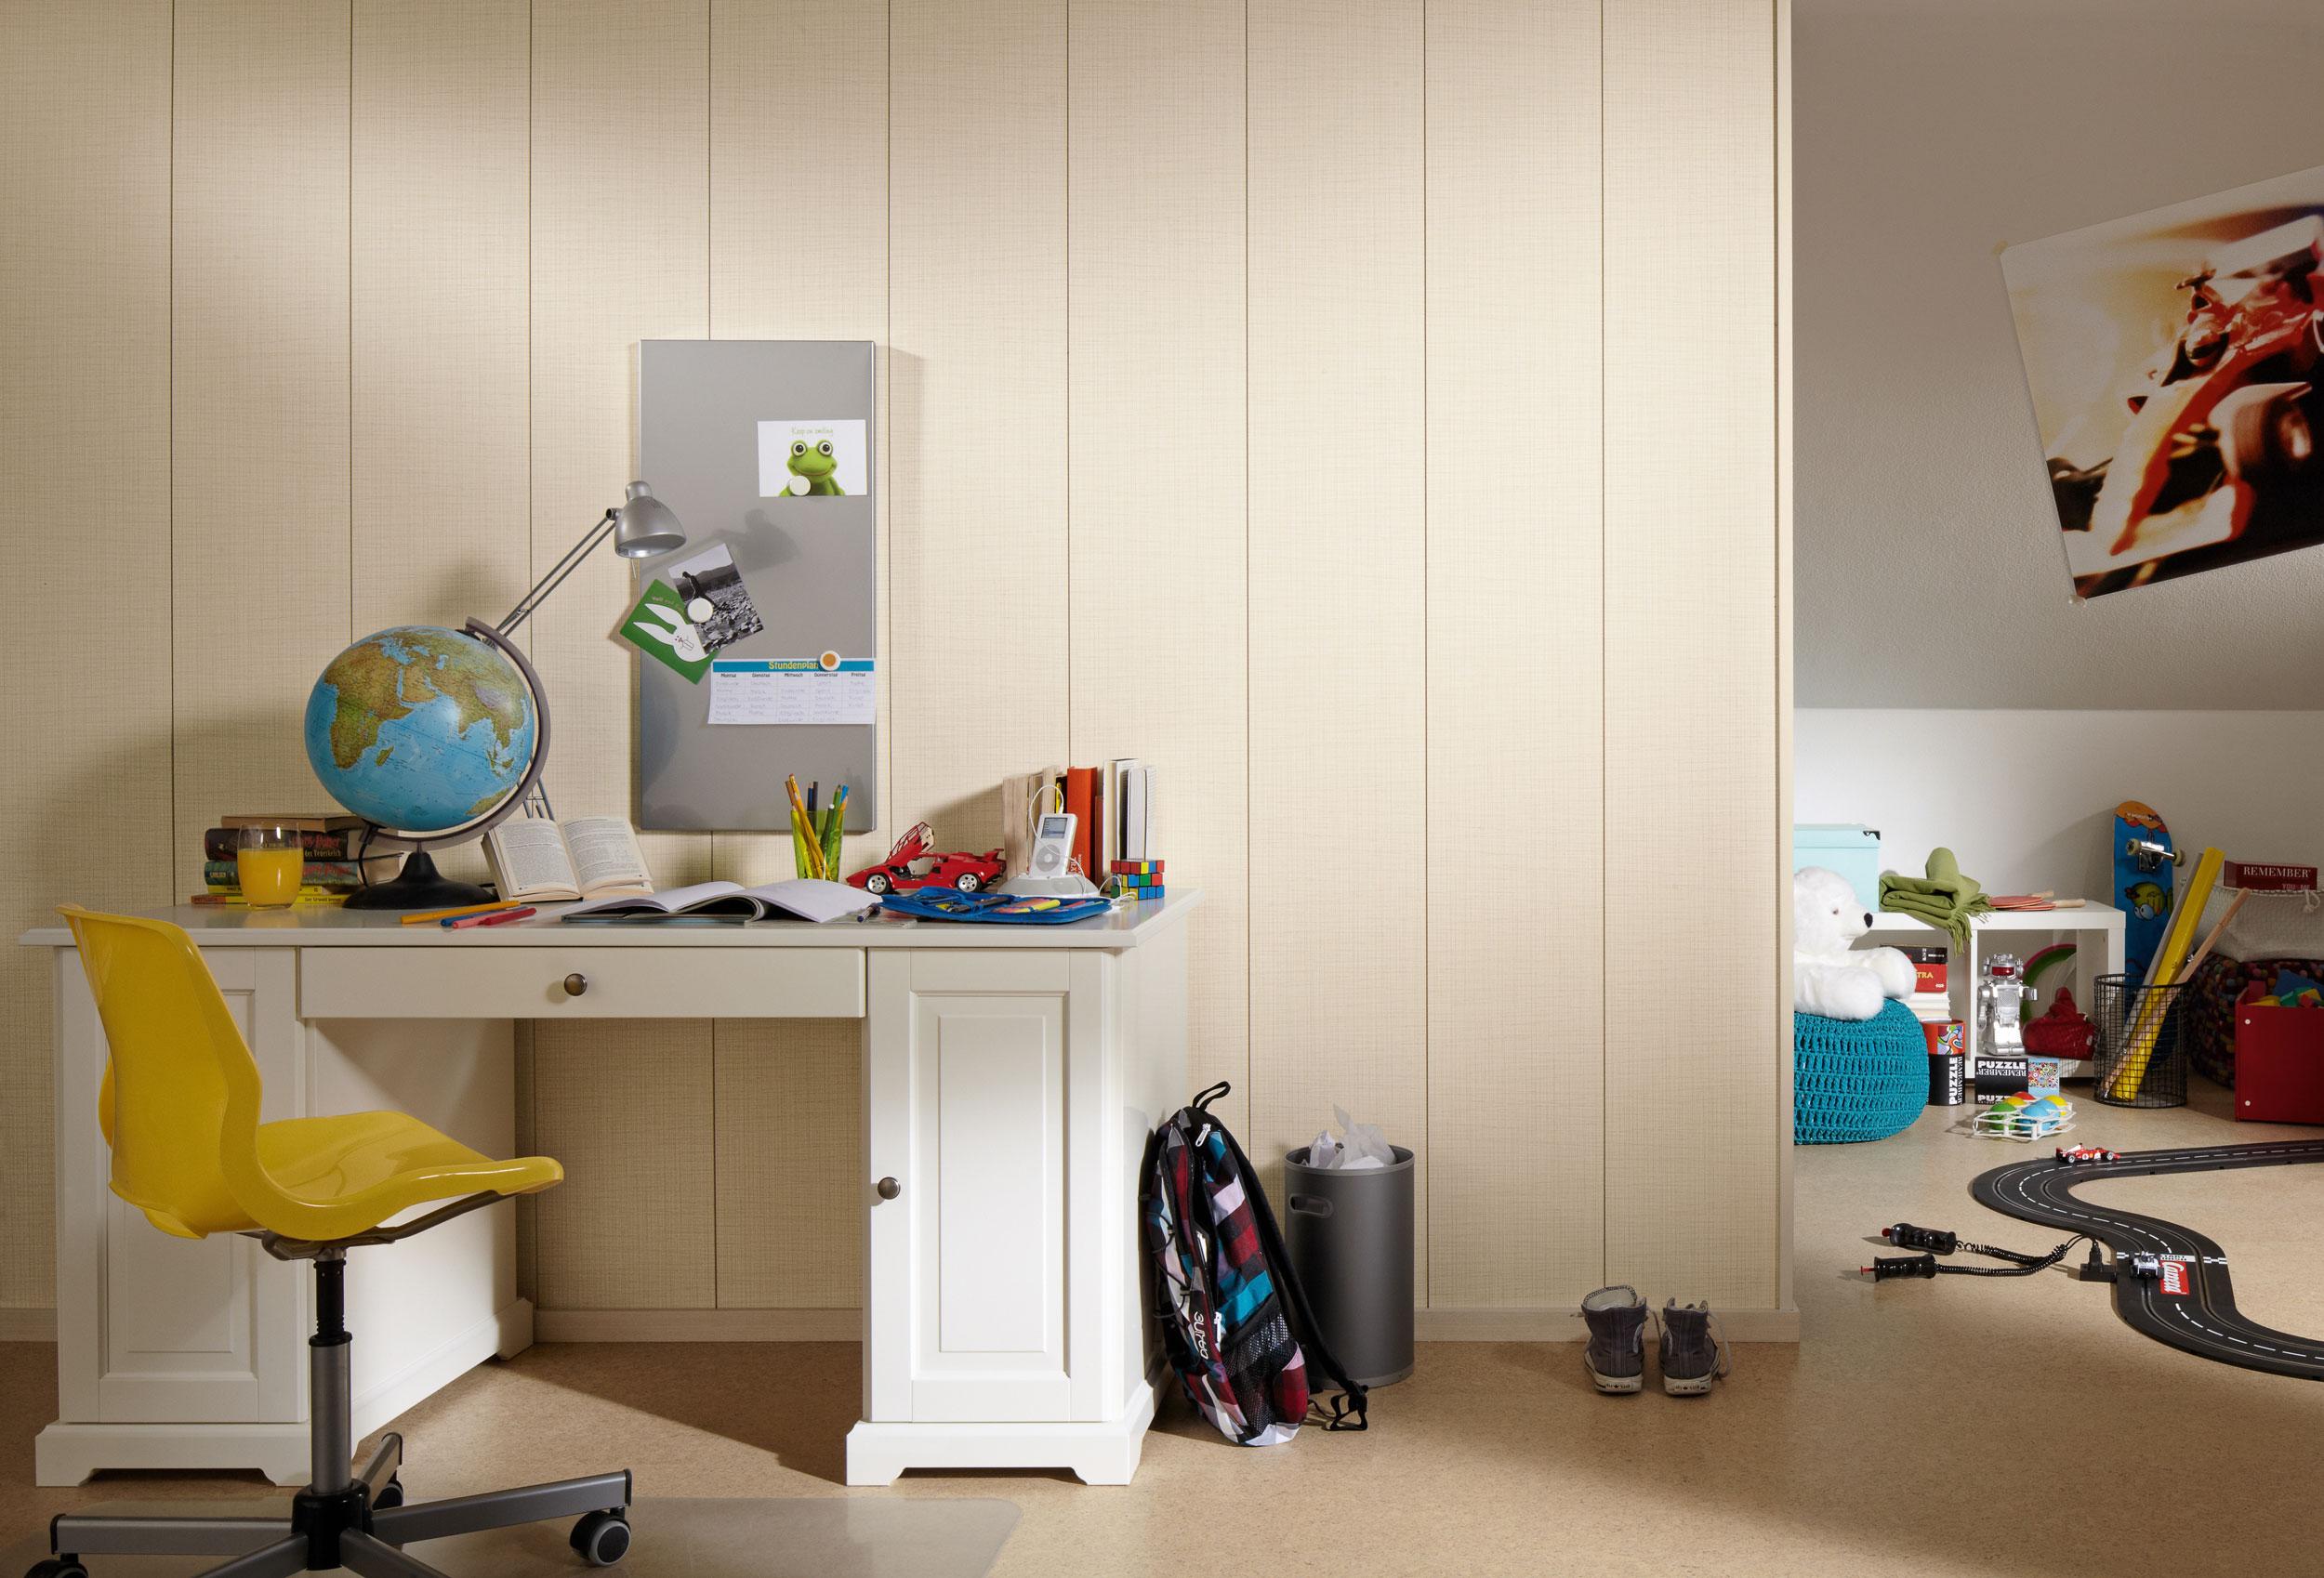 paneele f r wand und decke meister paneele bocado 300 erfurtholz. Black Bedroom Furniture Sets. Home Design Ideas